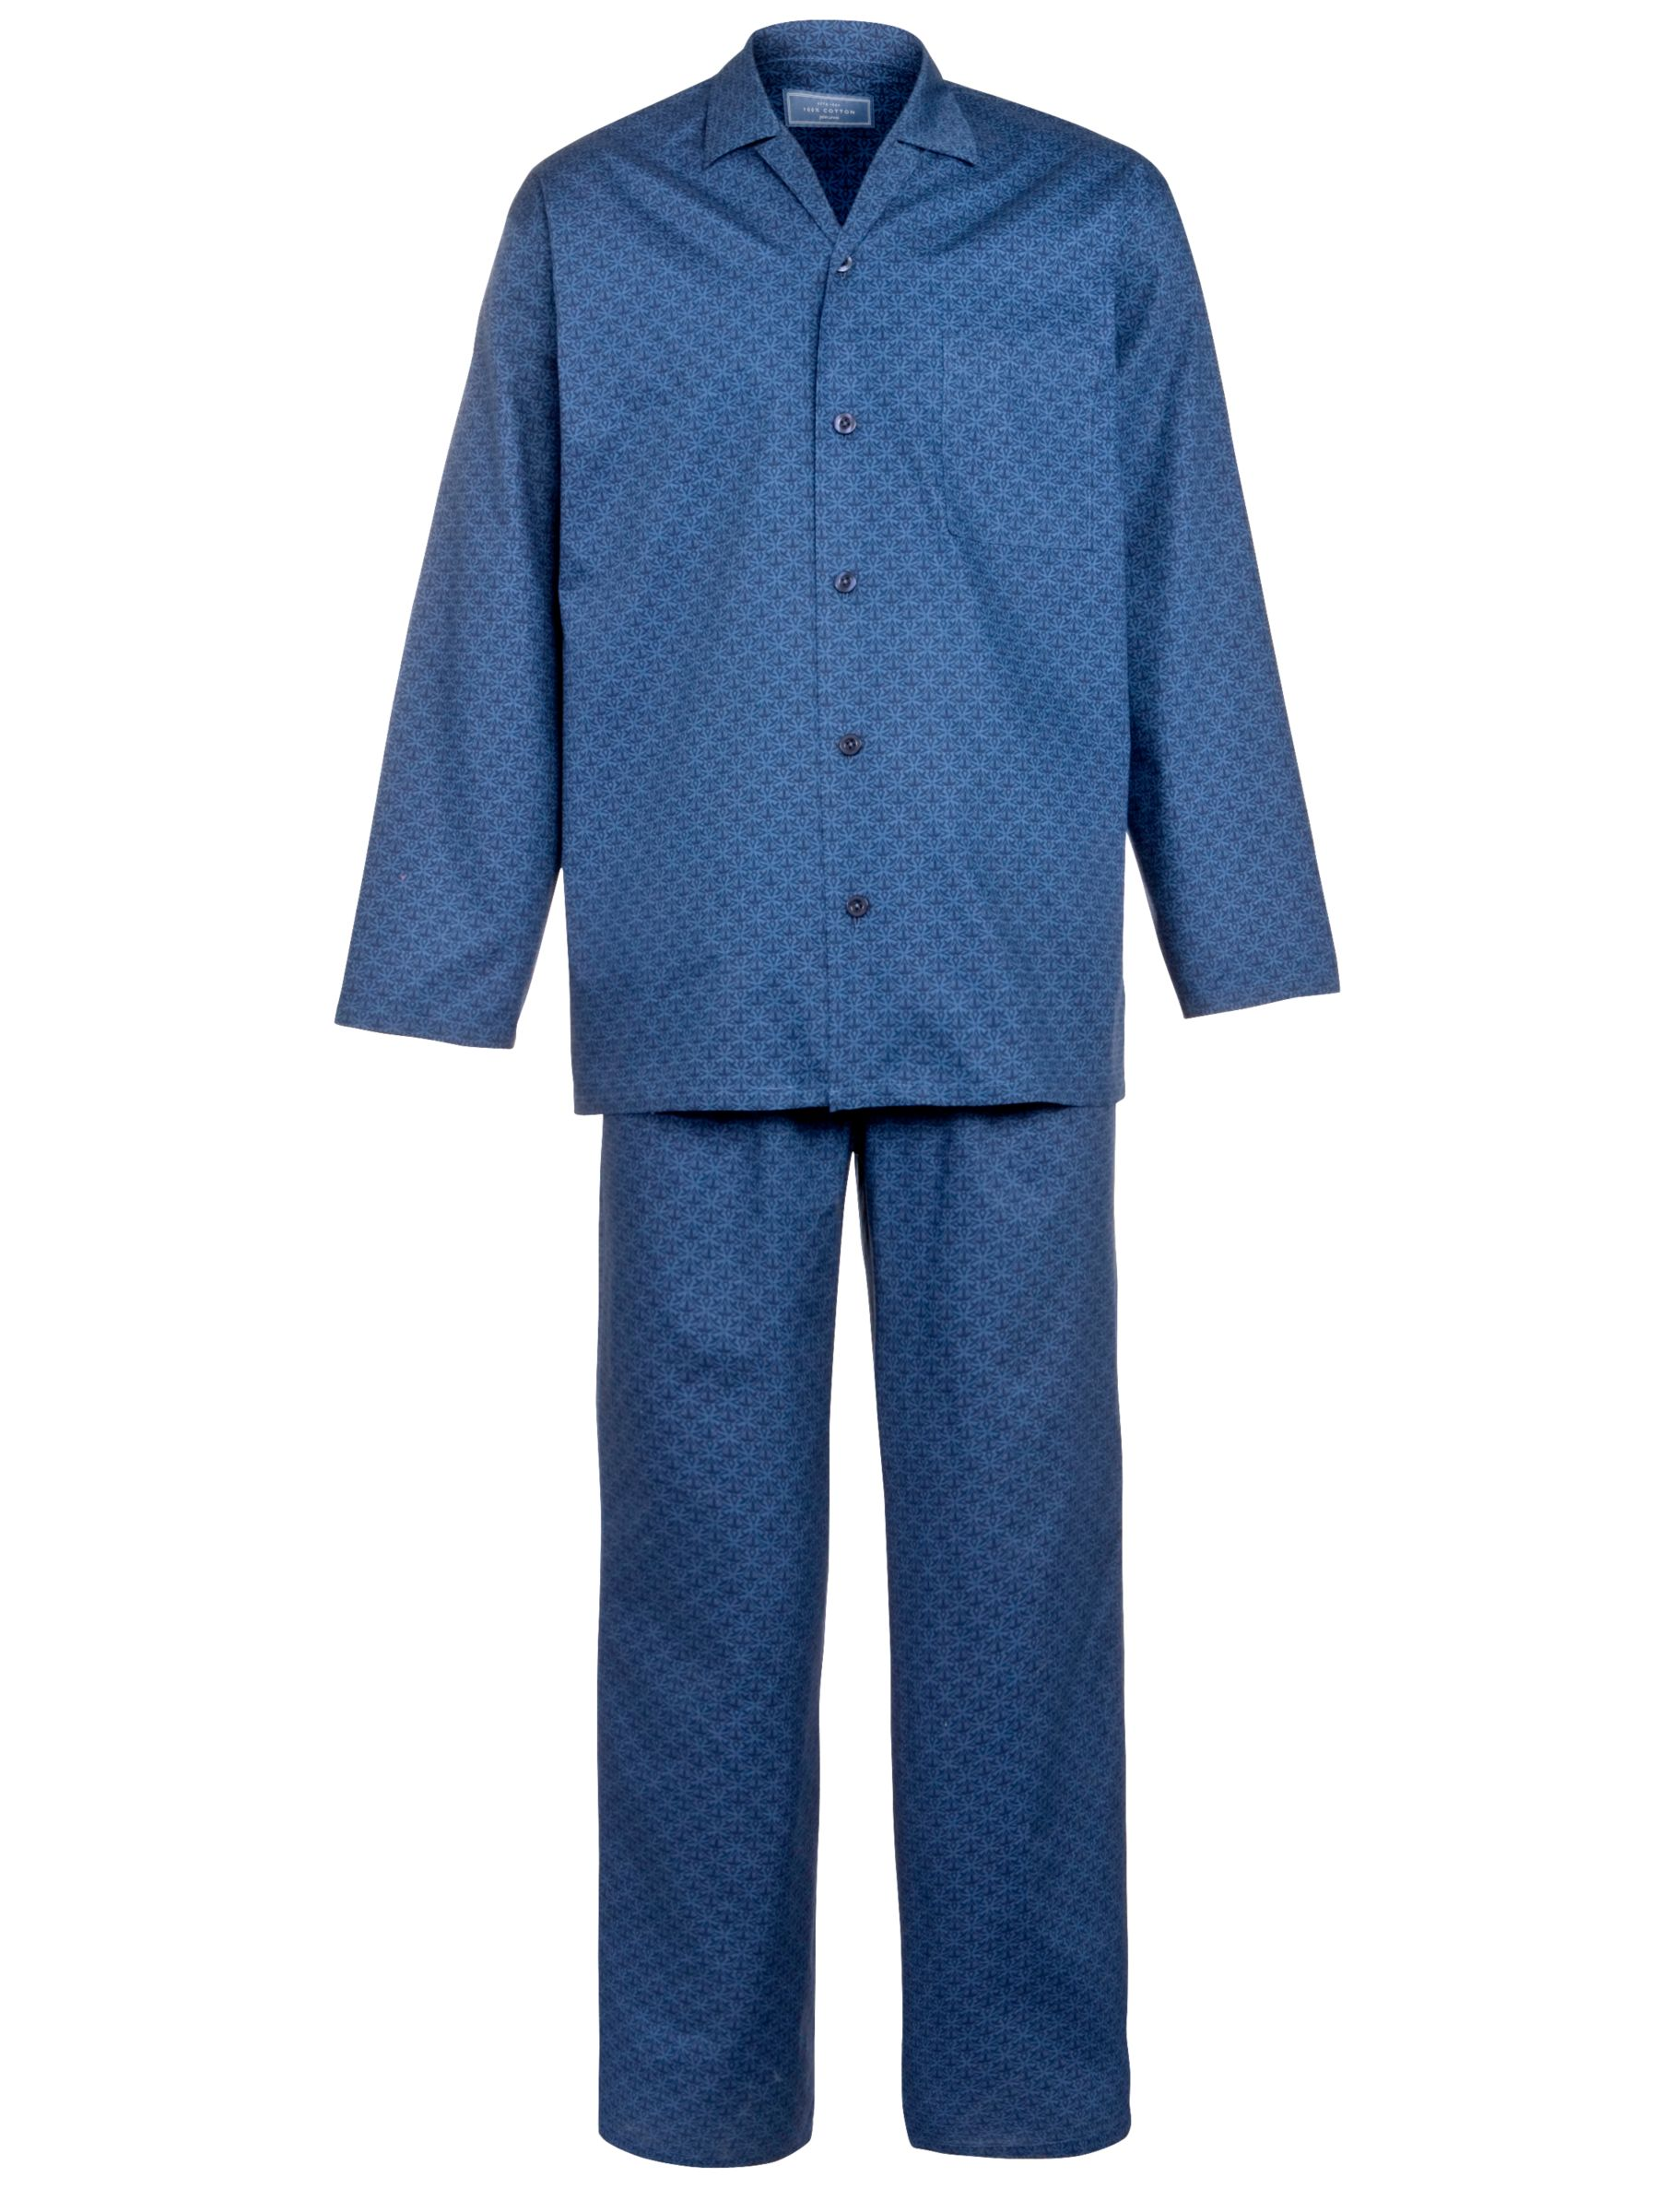 John Lewis 150 Year Cummersdale Print Pyjamas